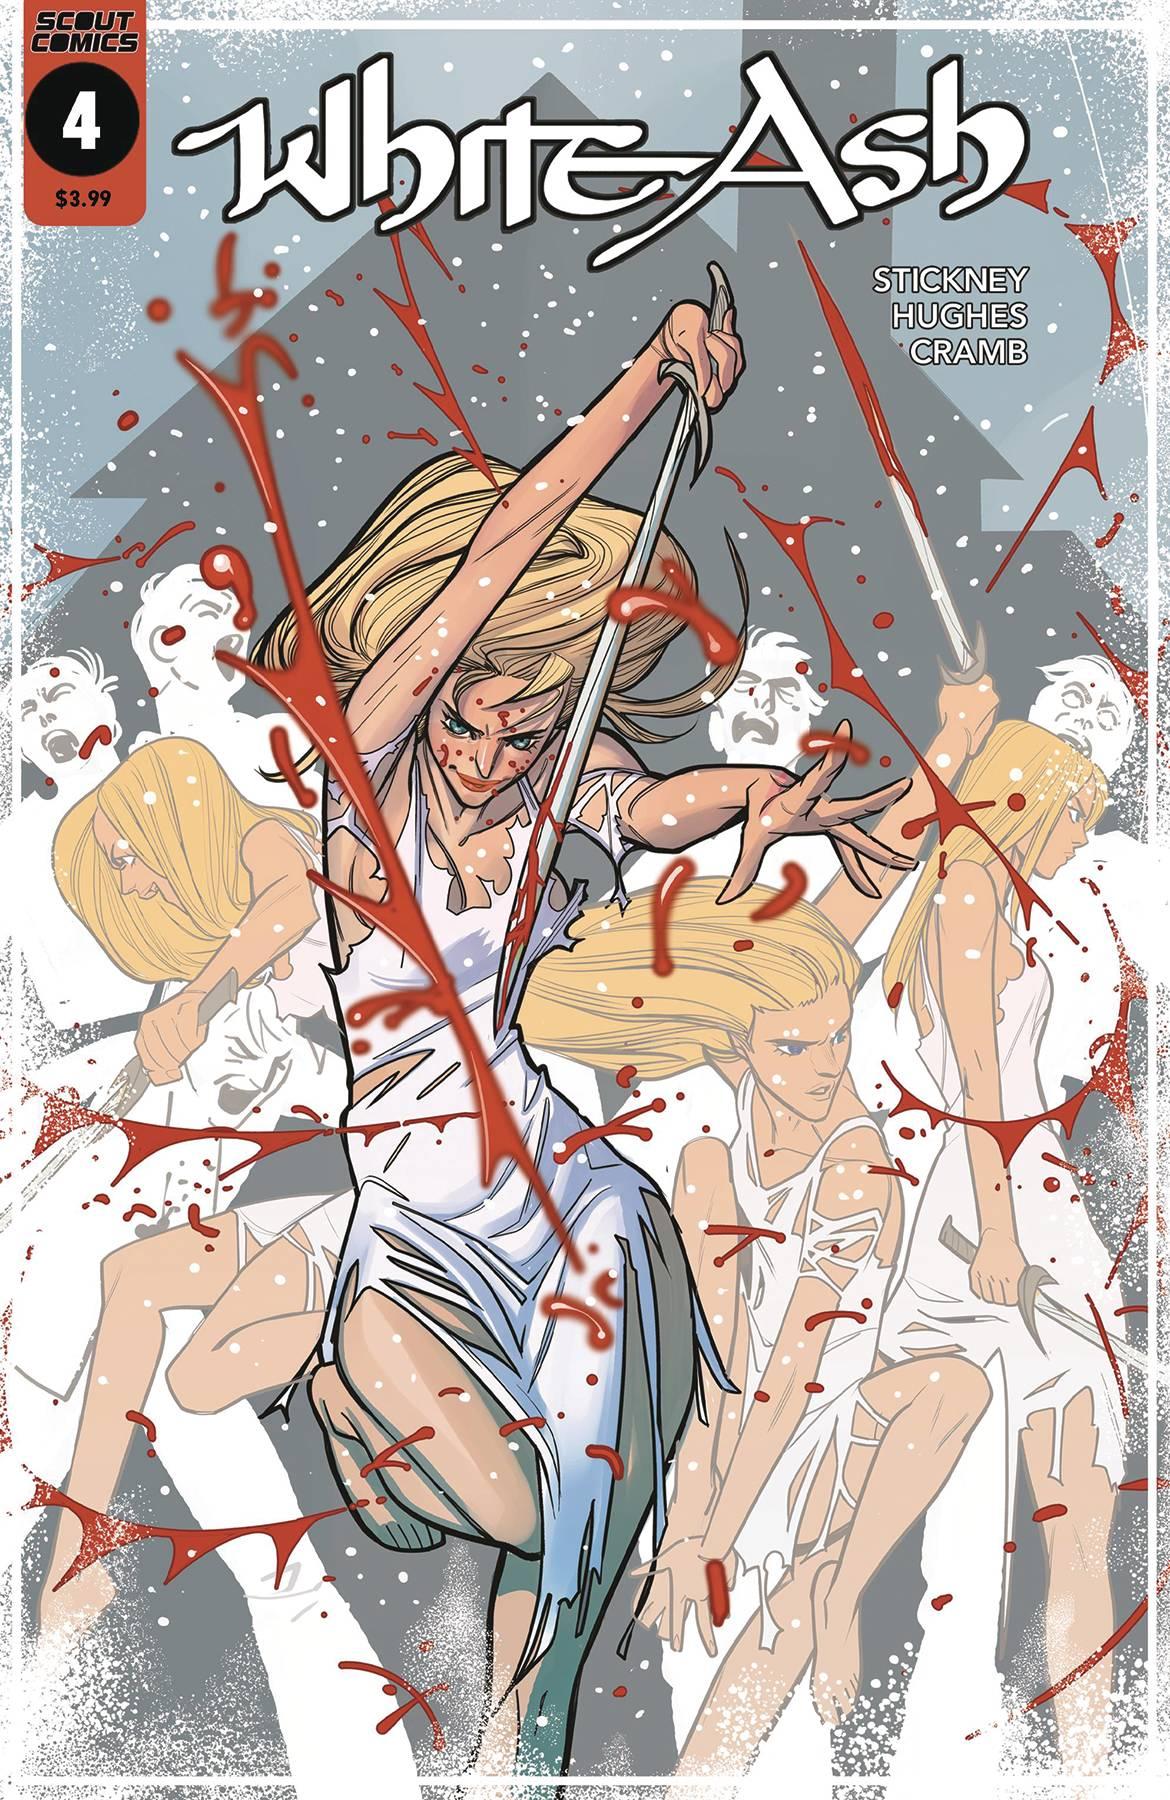 White Ash #4 (2020)